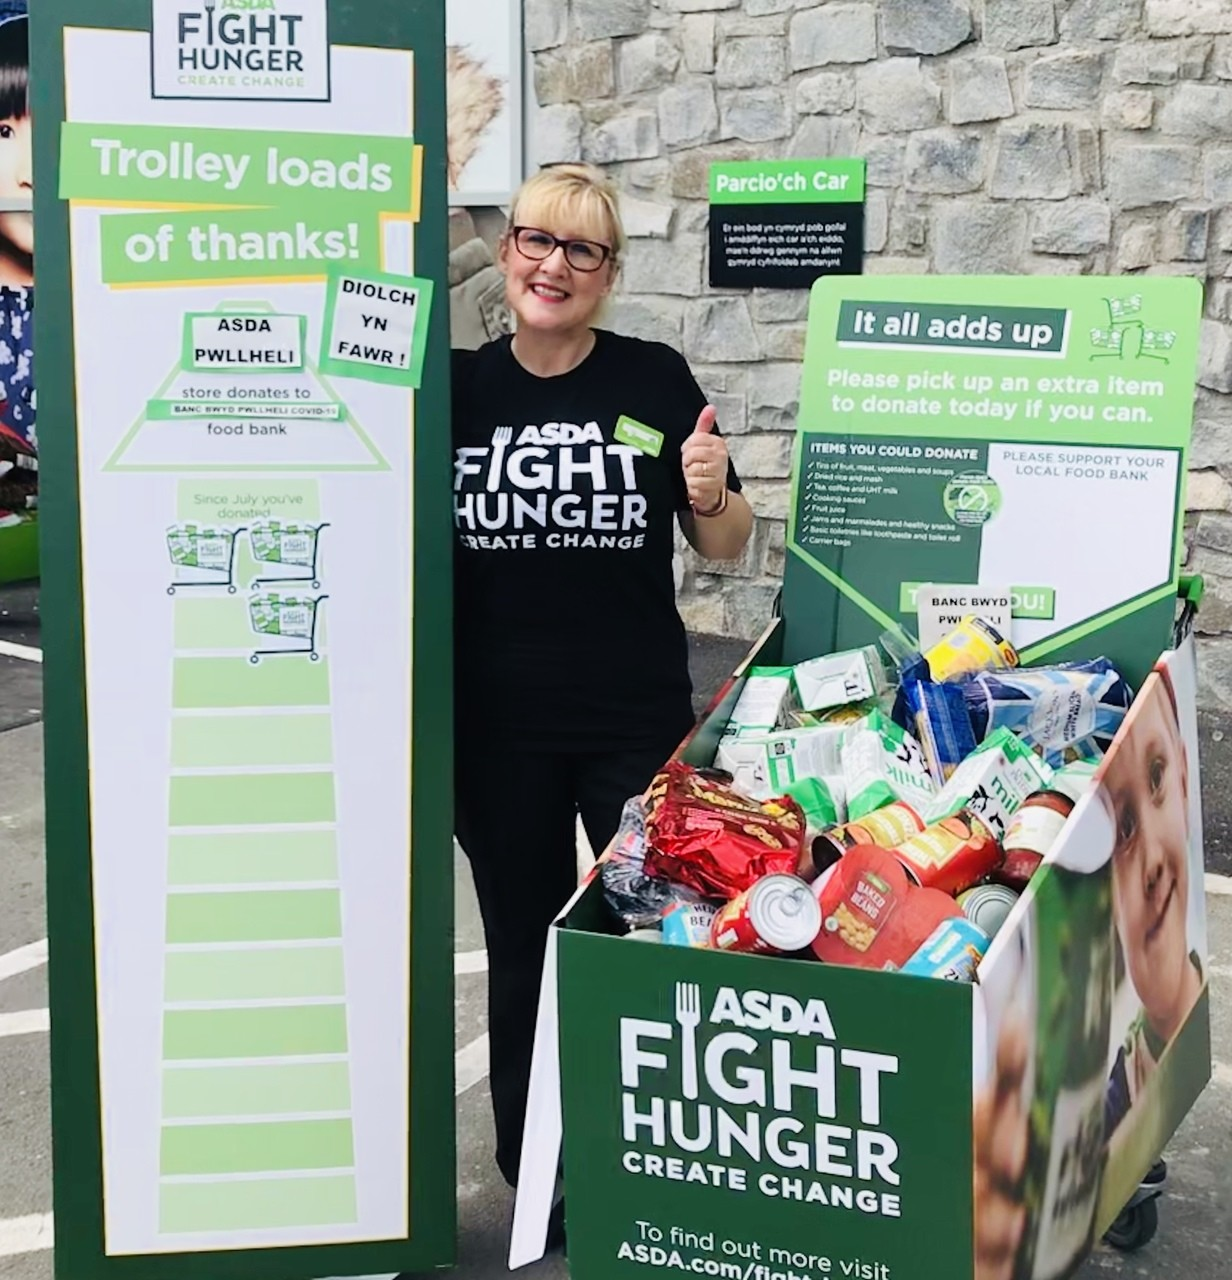 Supporting Fight Hunger Create change | Asda Pwllheli